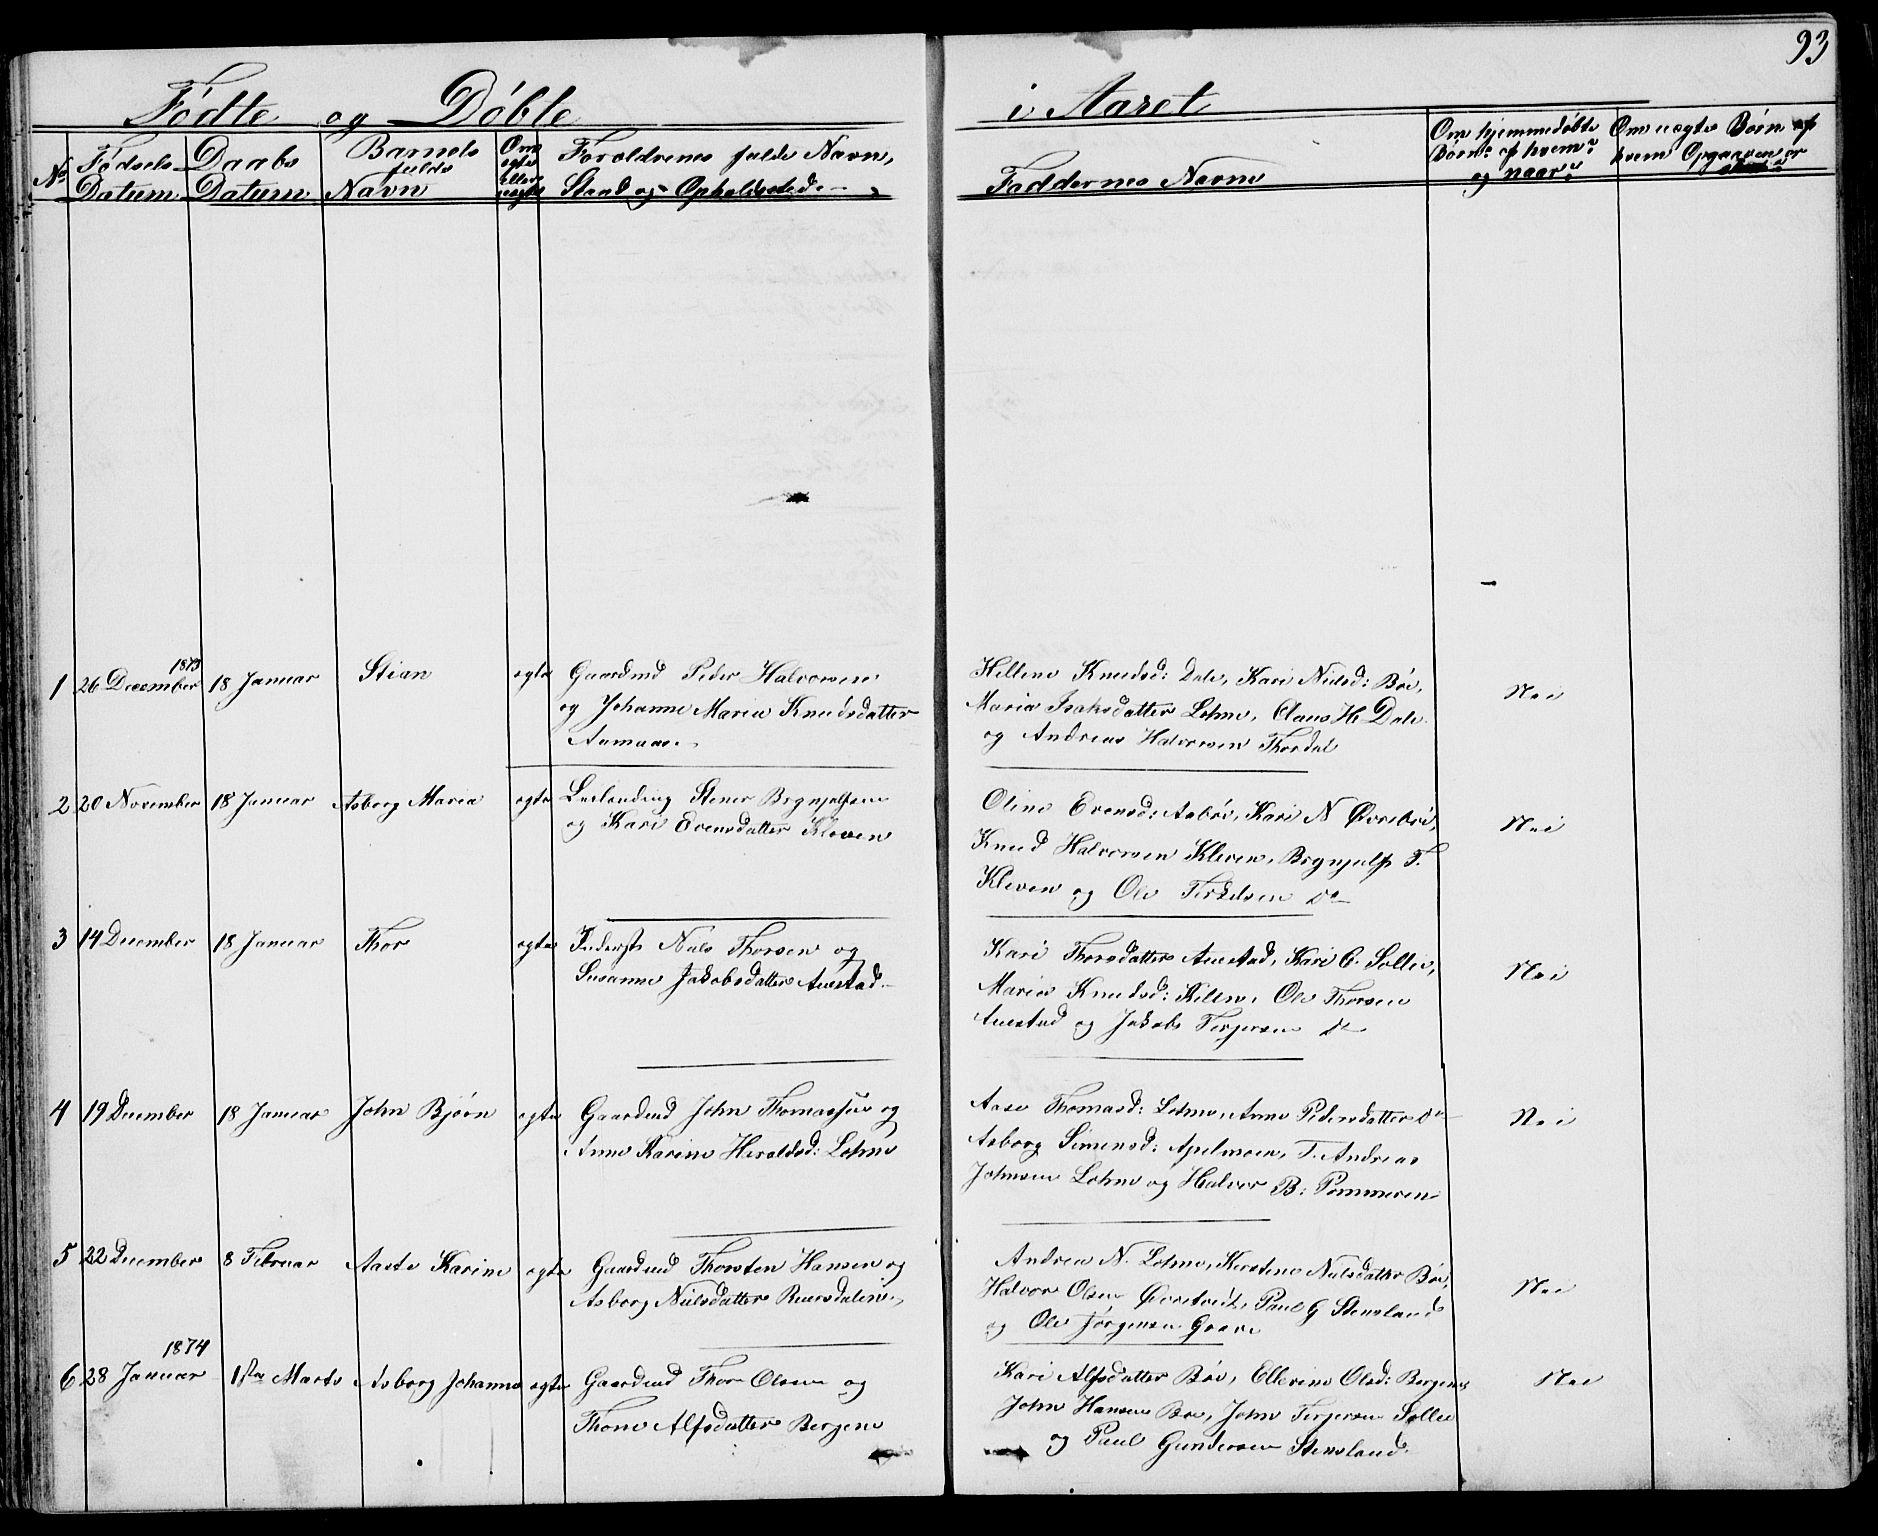 SAKO, Drangedal kirkebøker, G/Gb/L0001: Klokkerbok nr. II 1, 1856-1894, s. 93